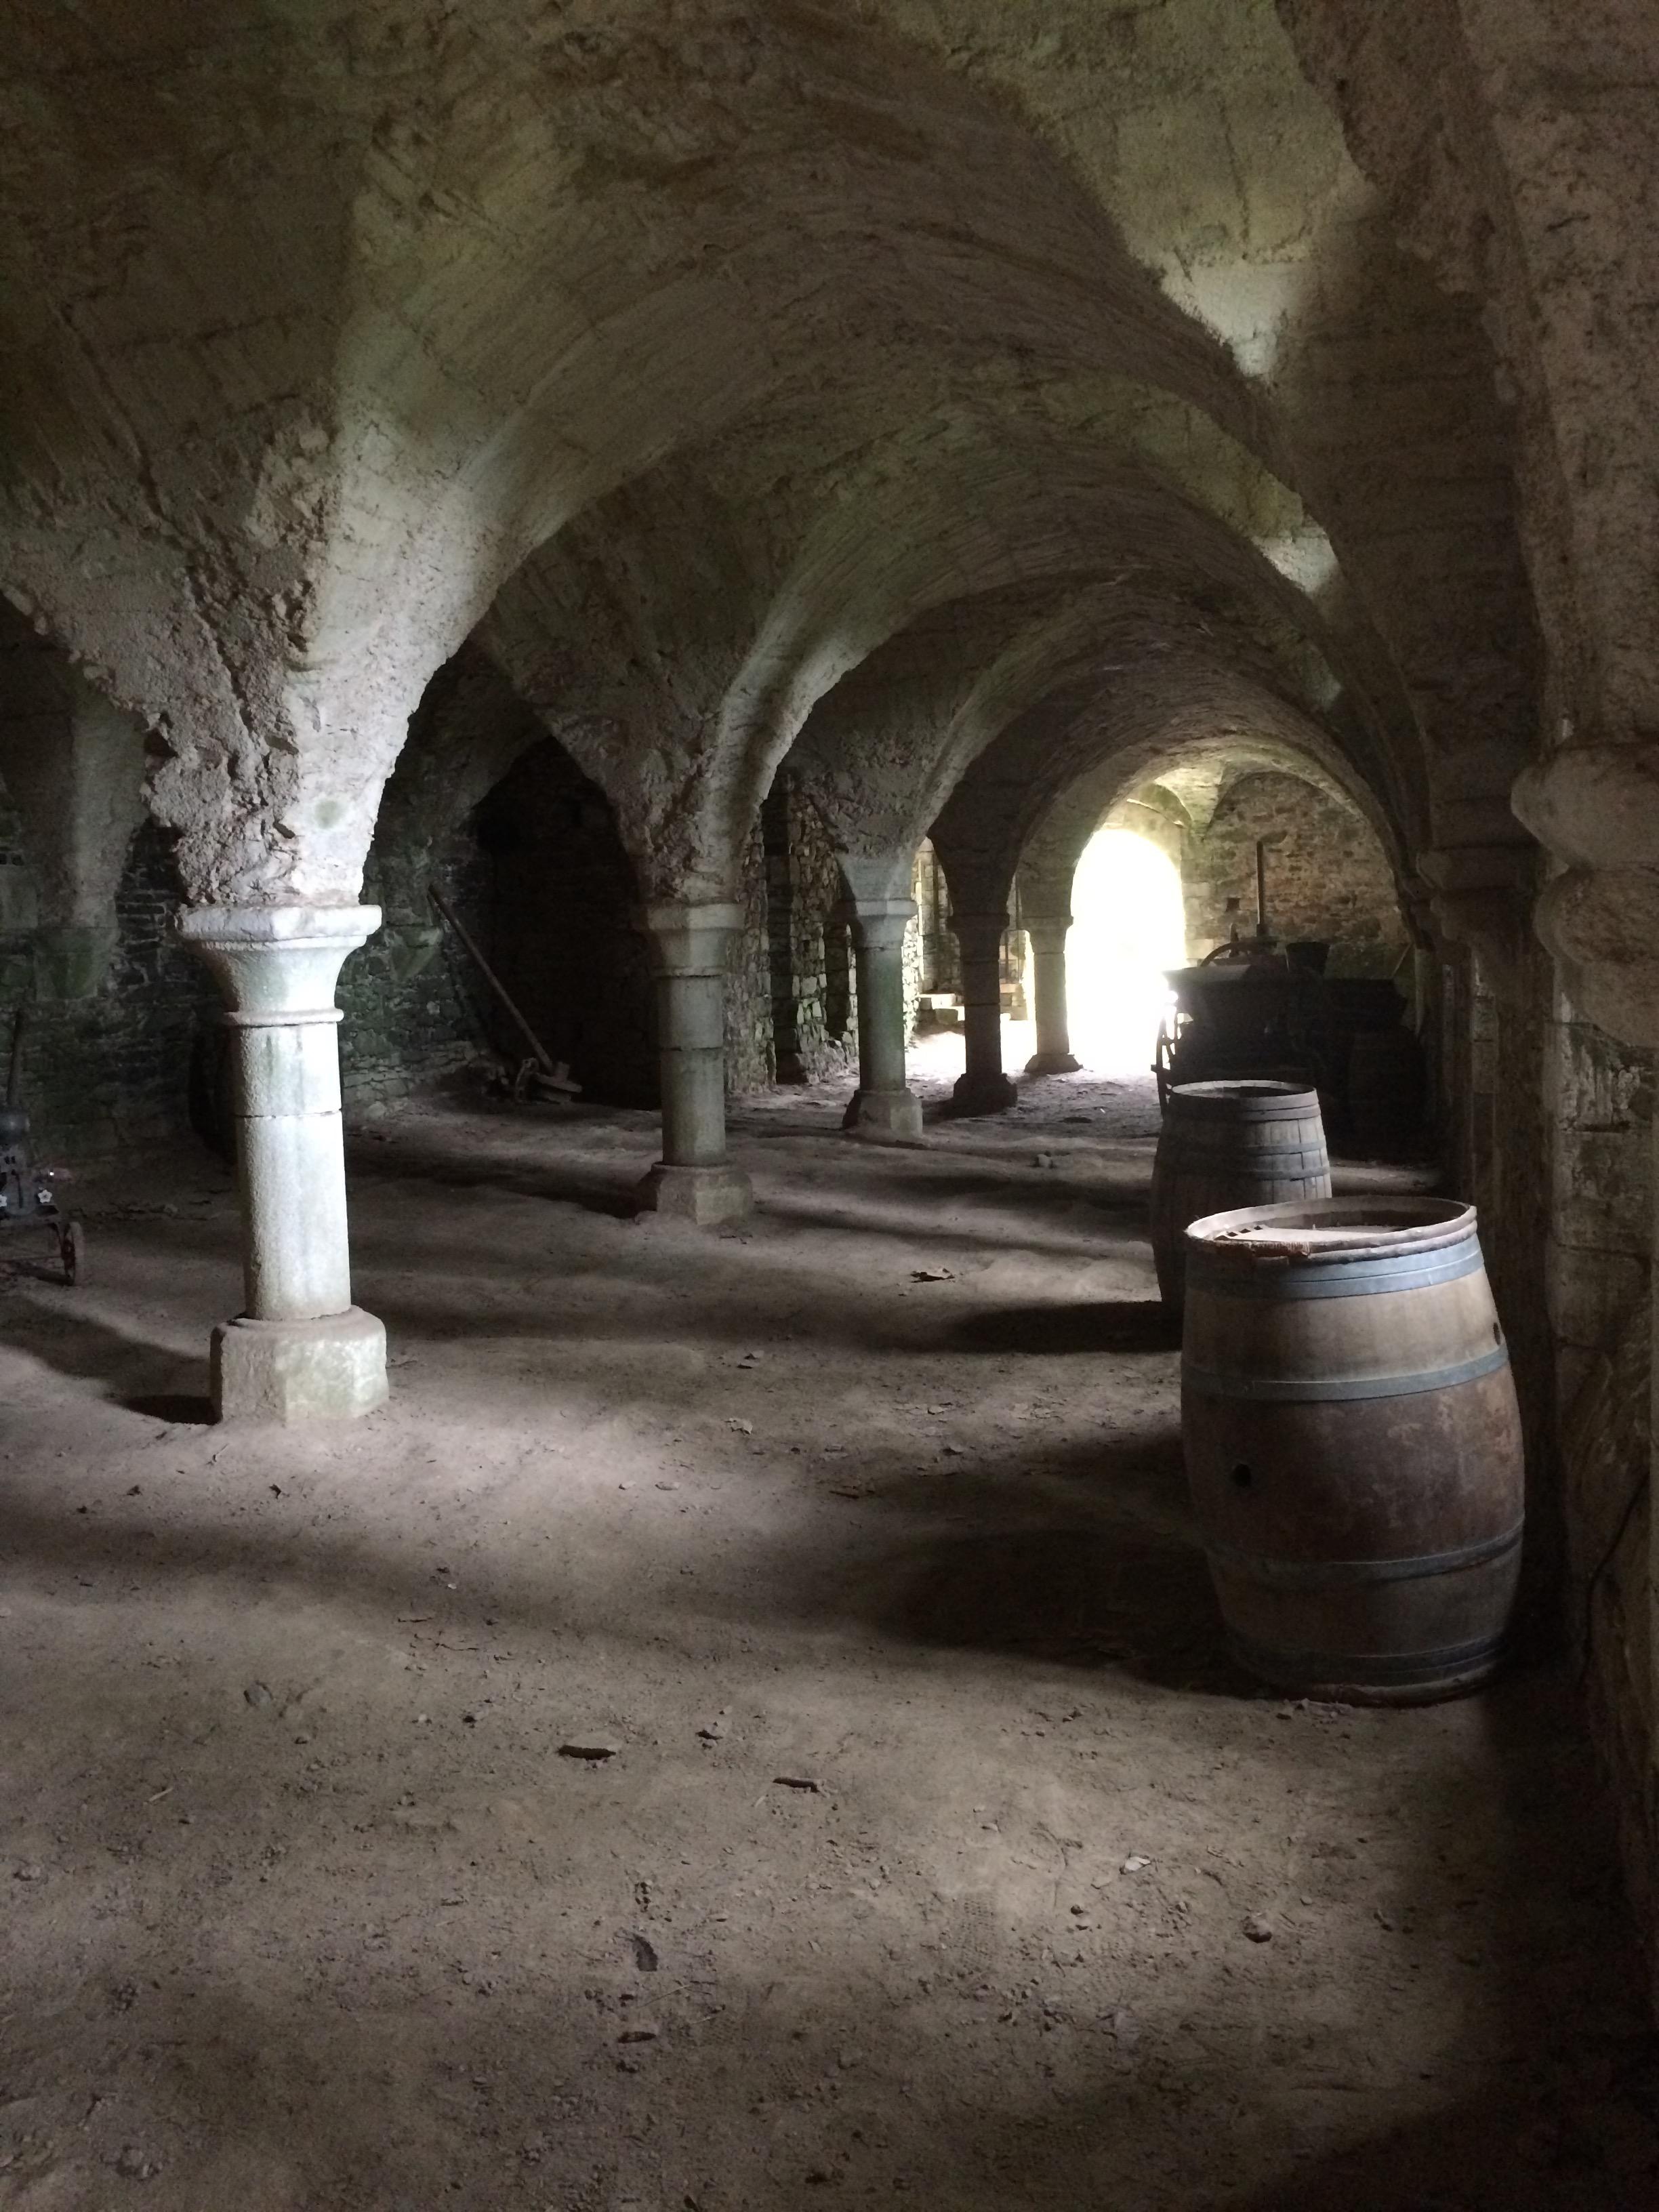 Stockage De Vin file:cave stockage du vin - abbaye de beauport - wikimedia commons